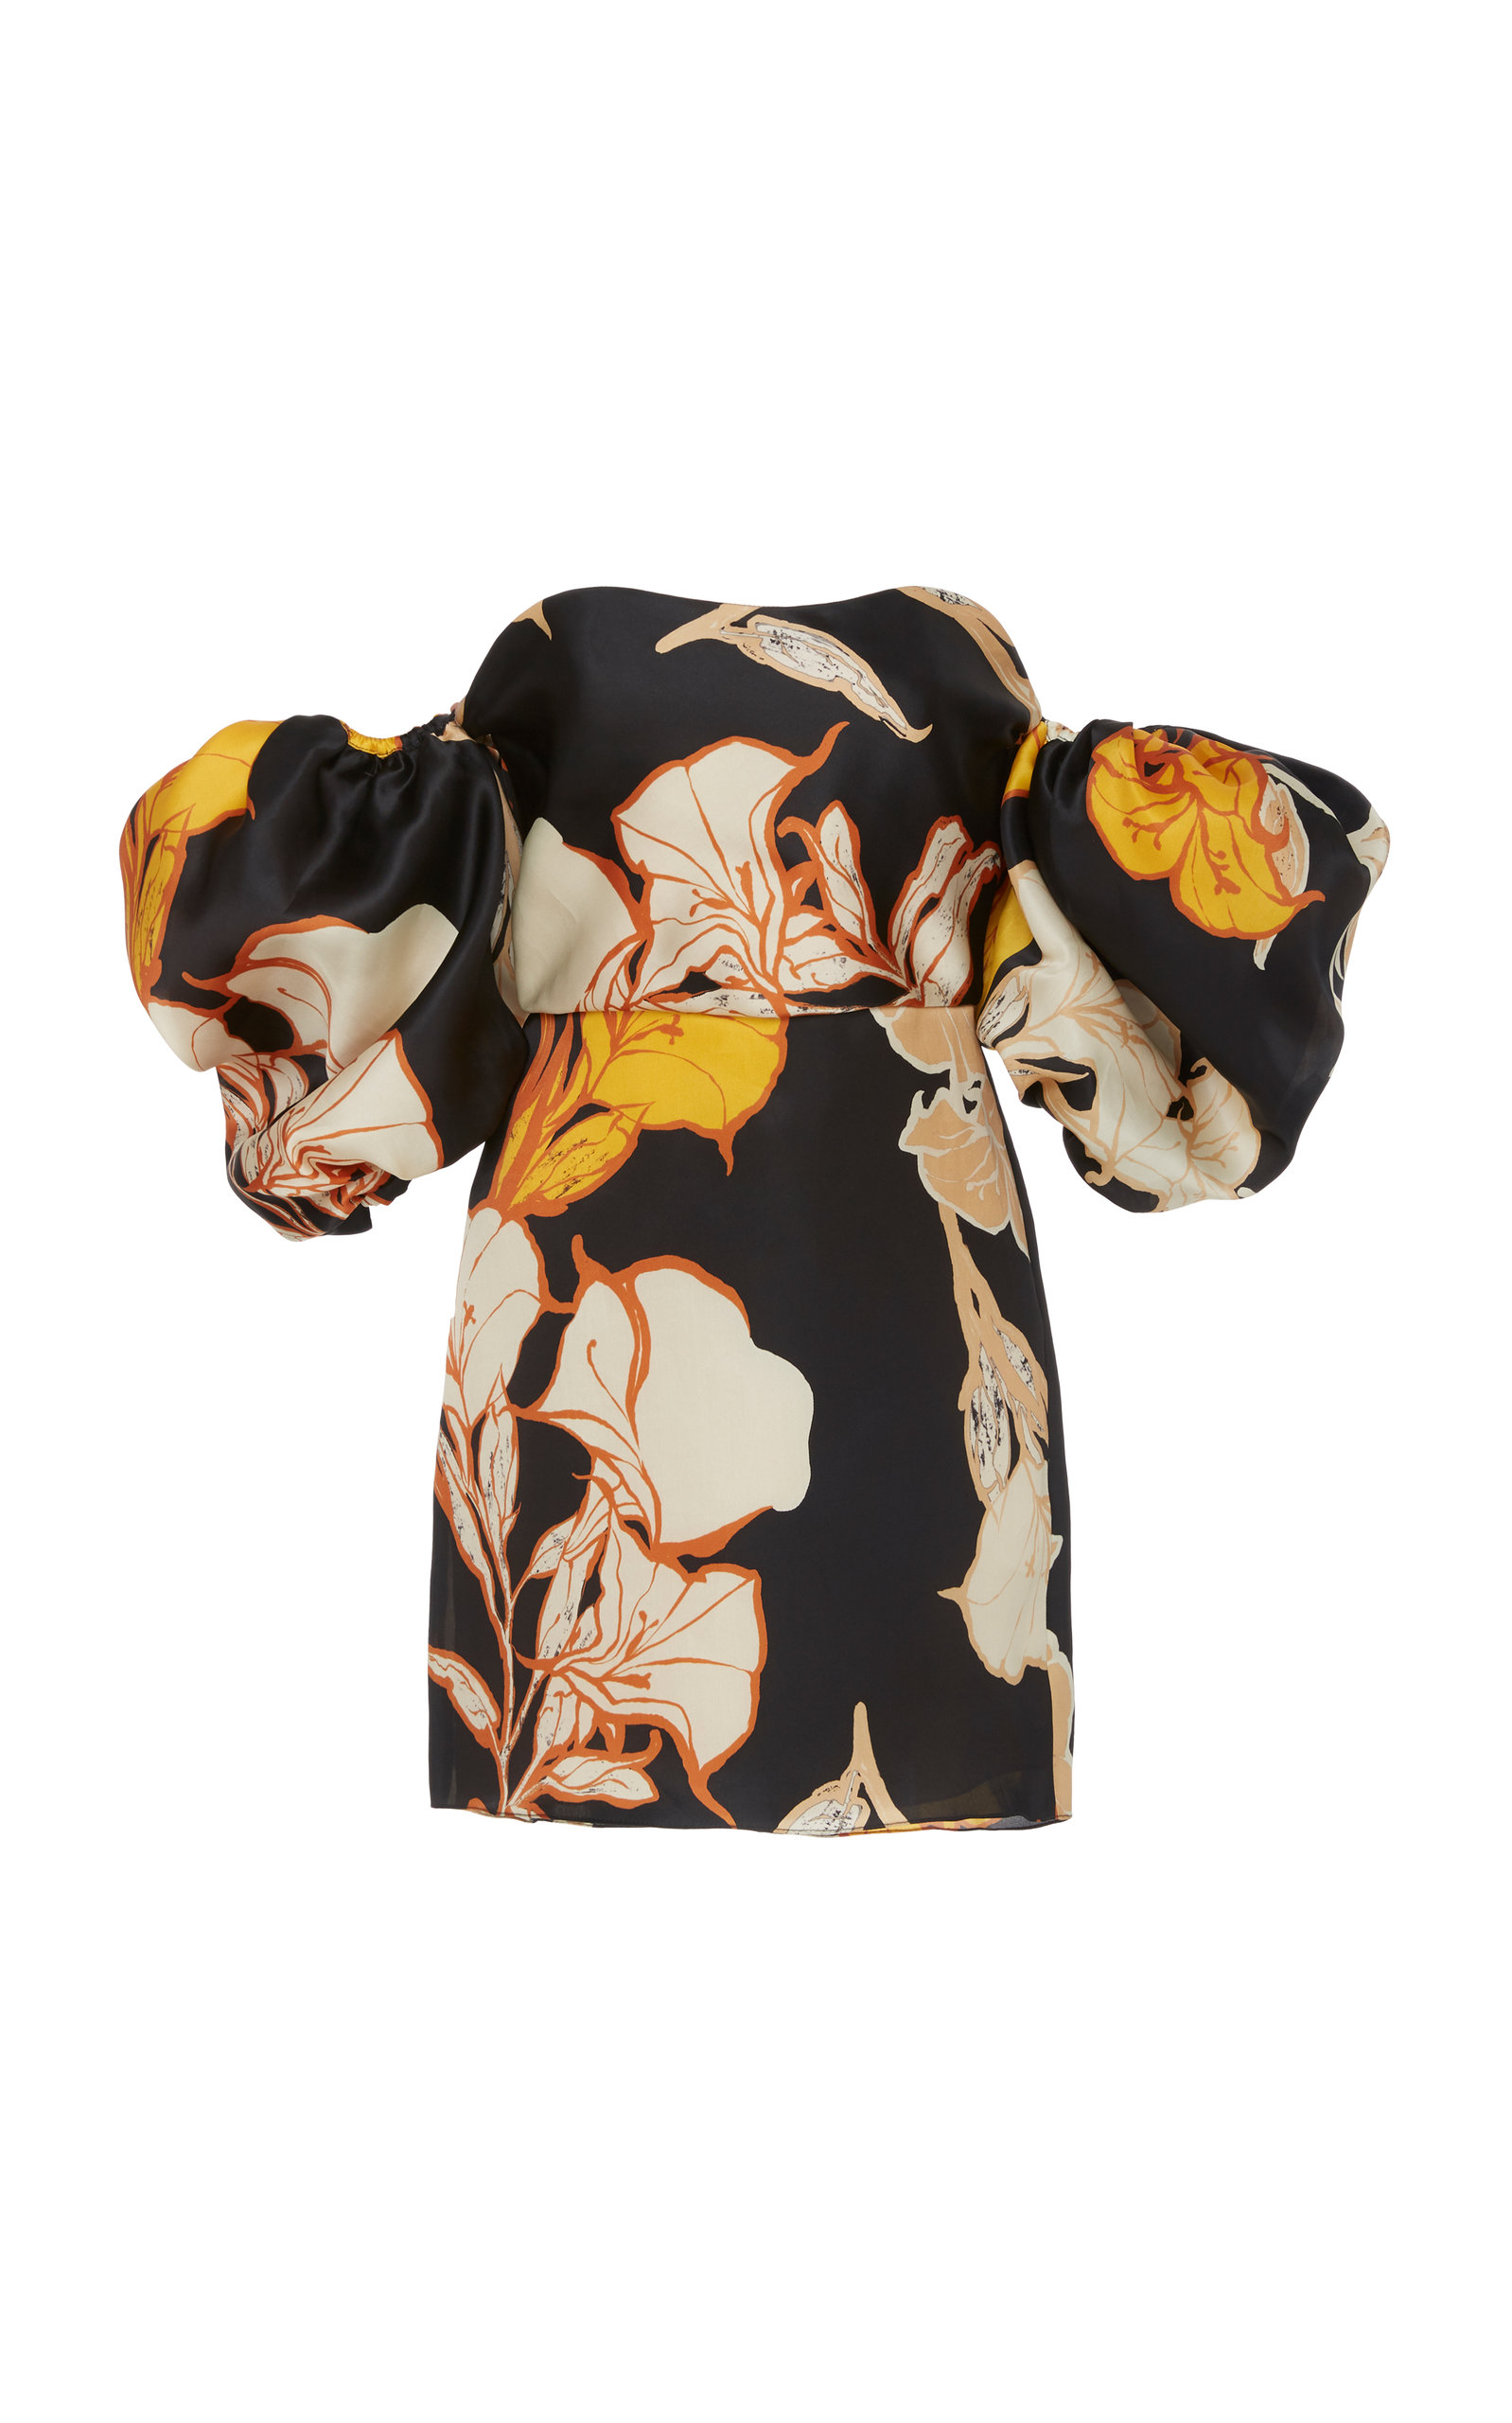 Buy Johanna Ortiz Cosmic Origin Floral-Print Silk-Satin Mini Dress online, shop Johanna Ortiz at the best price